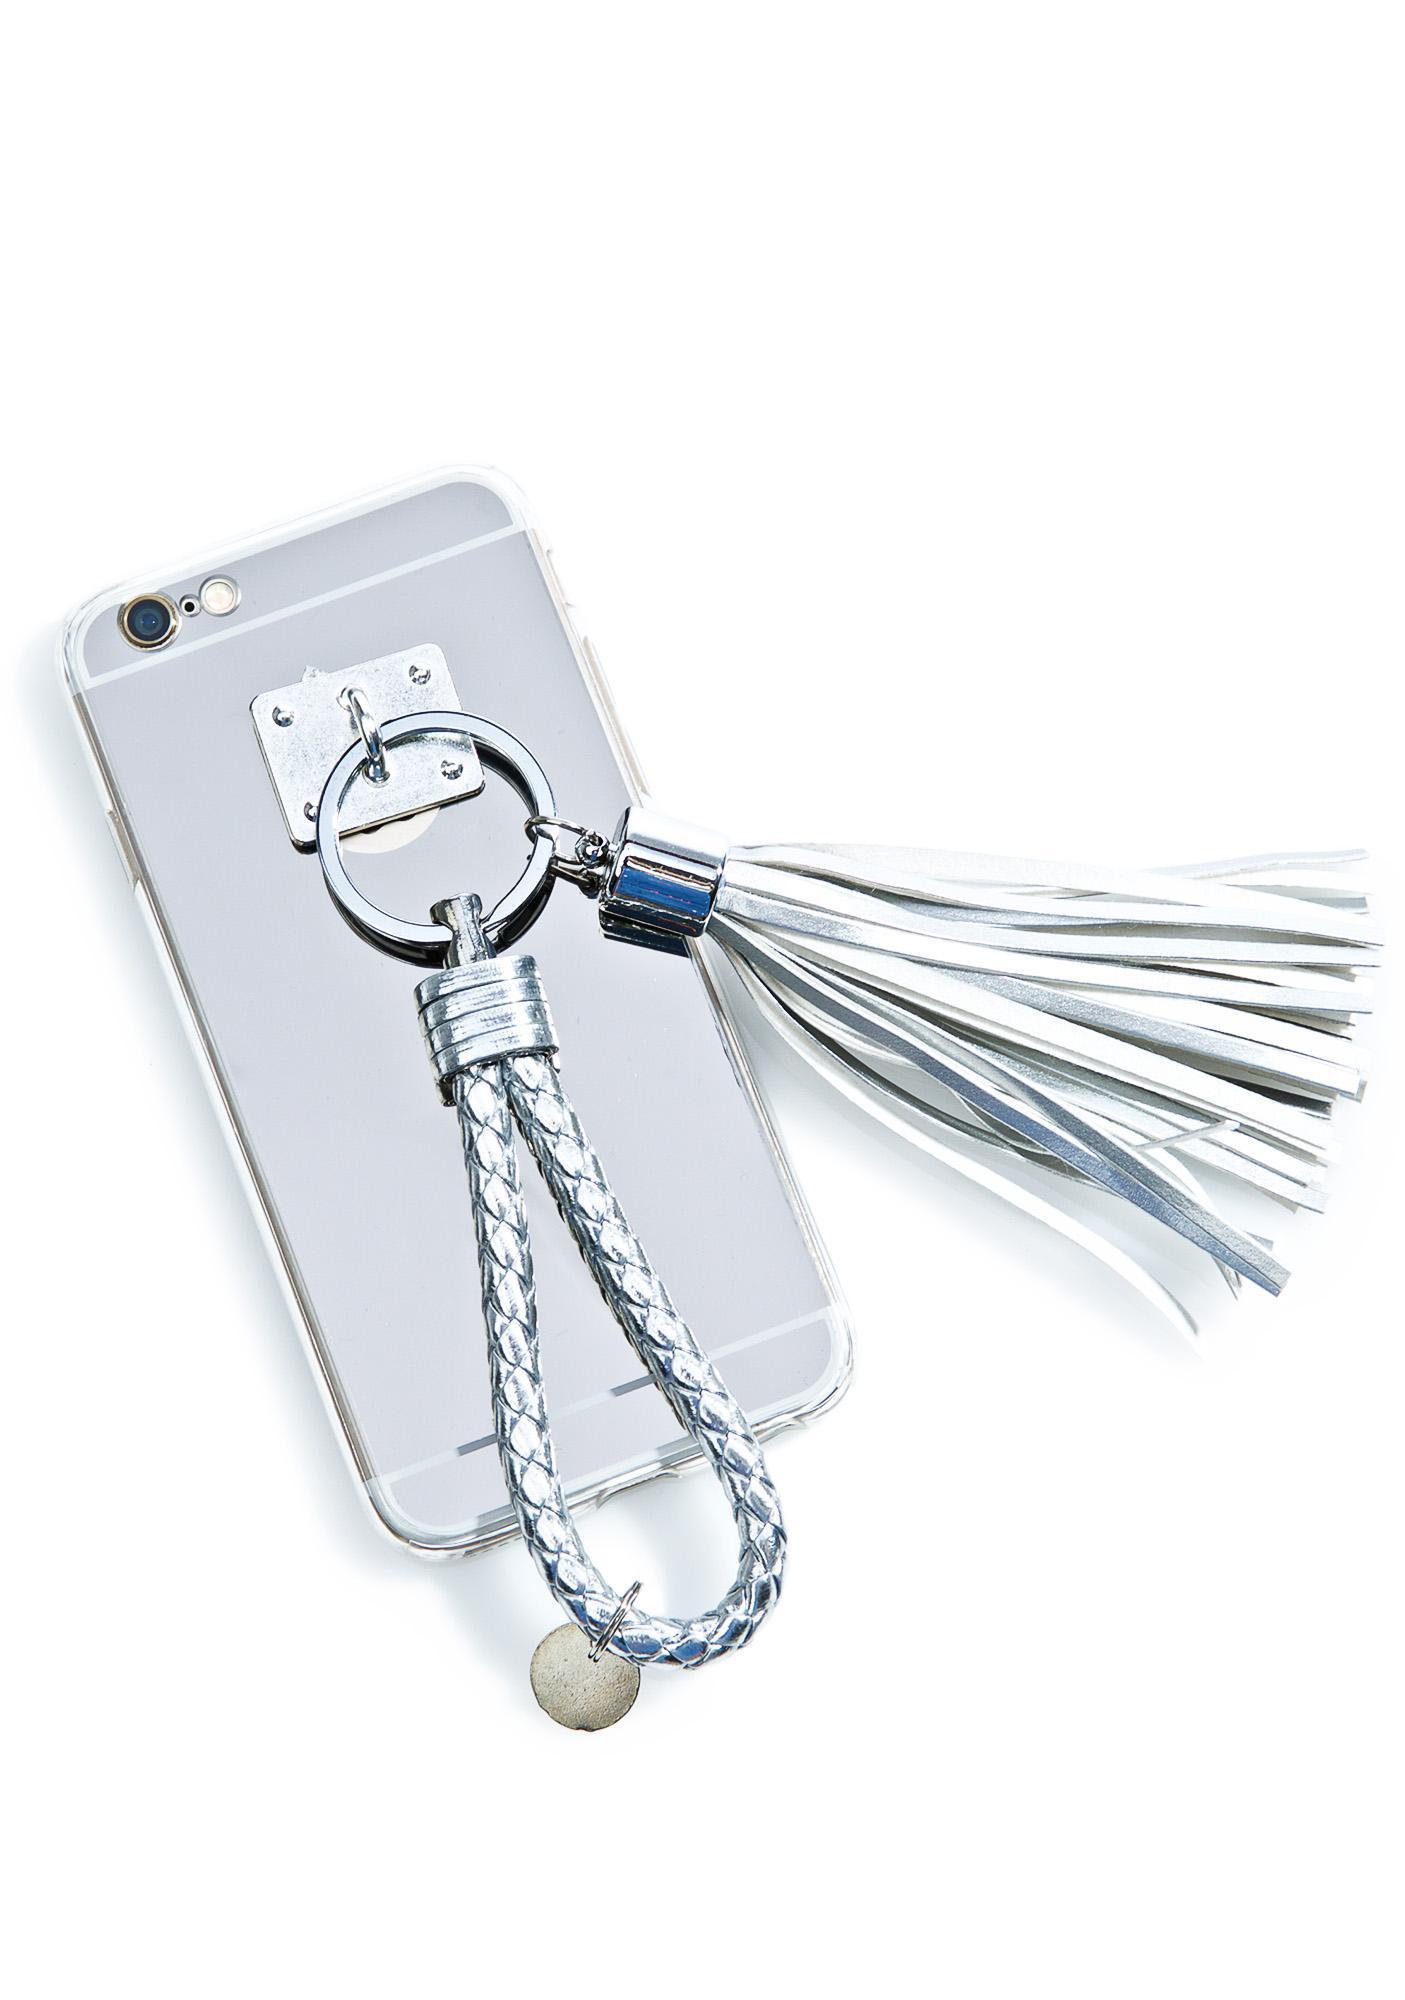 I'm A Flirt Tassel iPhone 6/6+ Case